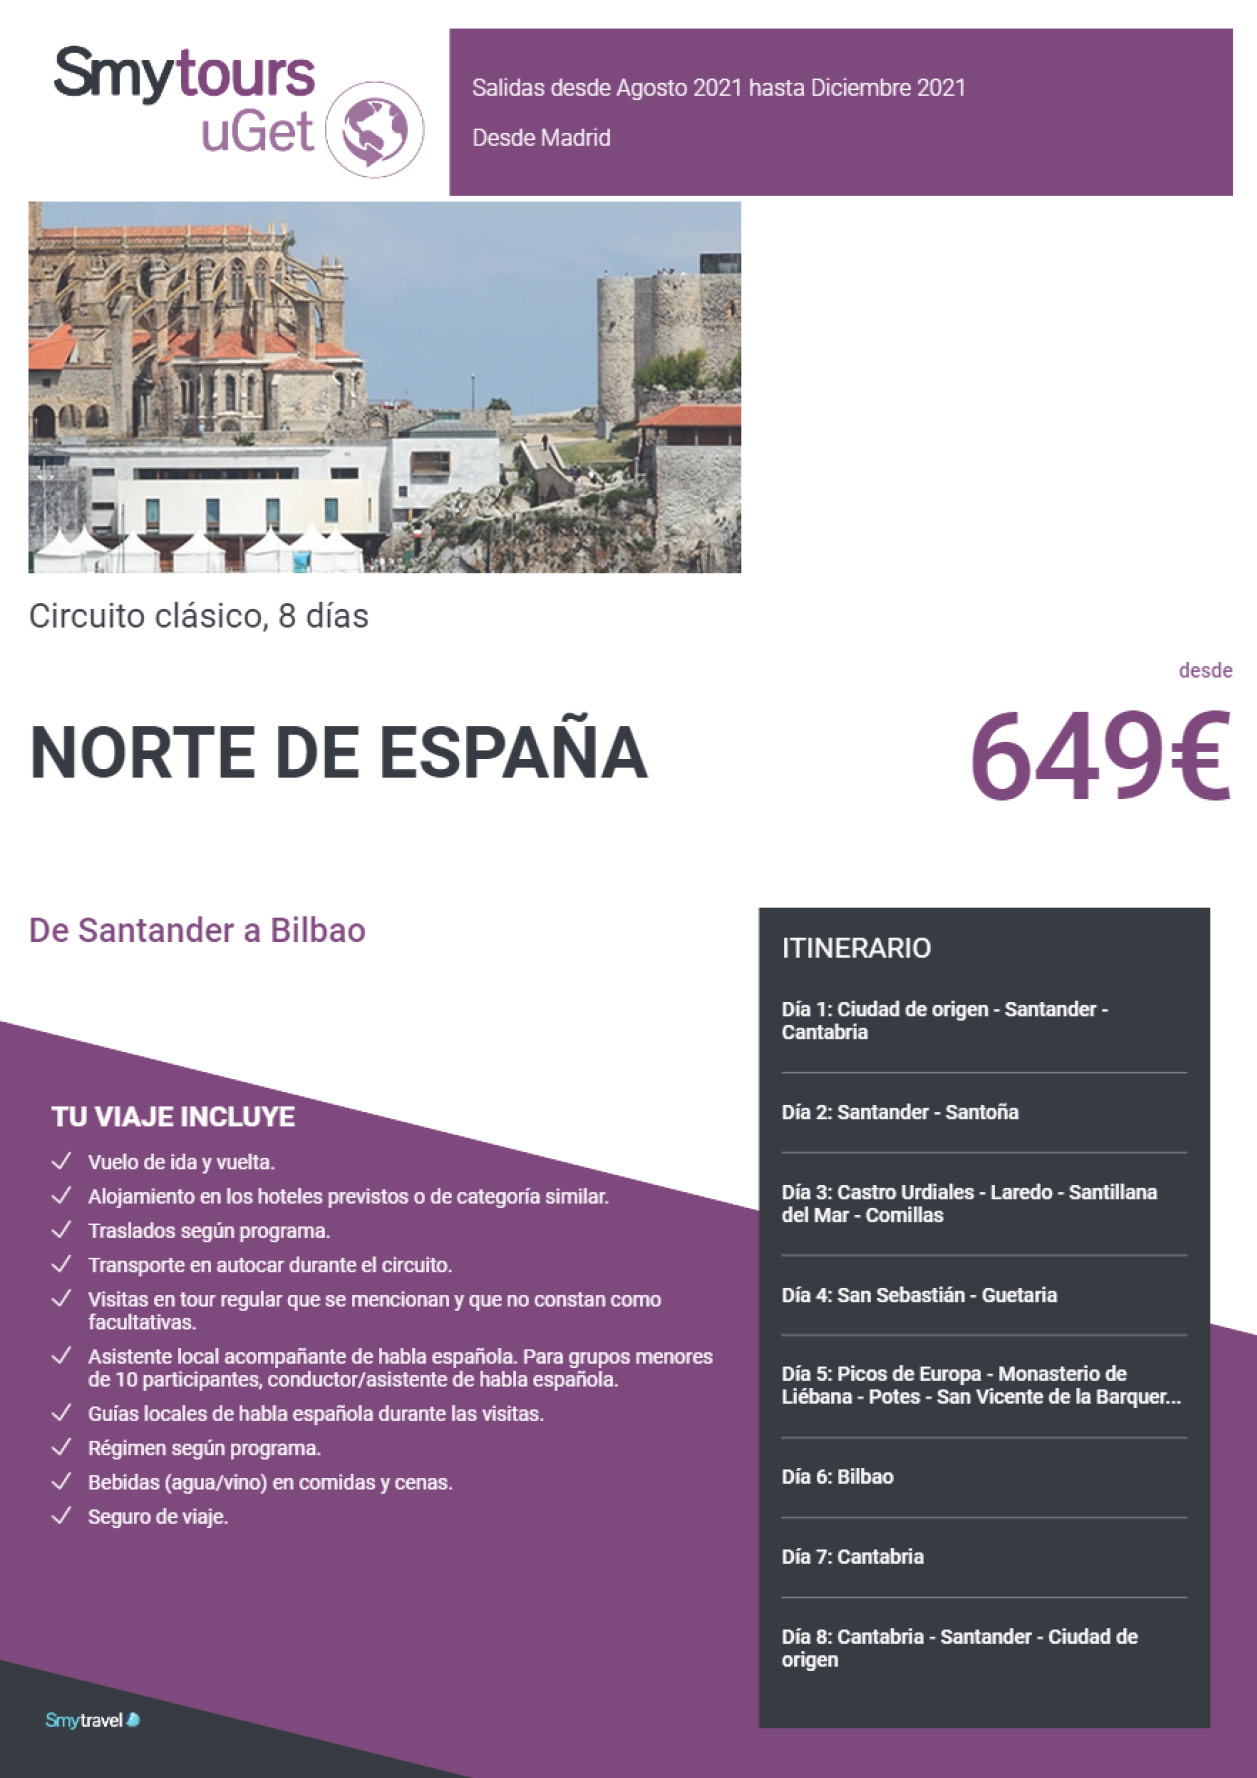 Oferta Smytravel Circuito de Santander a Bilbao 8 dias salidas Madrid desde 649 €